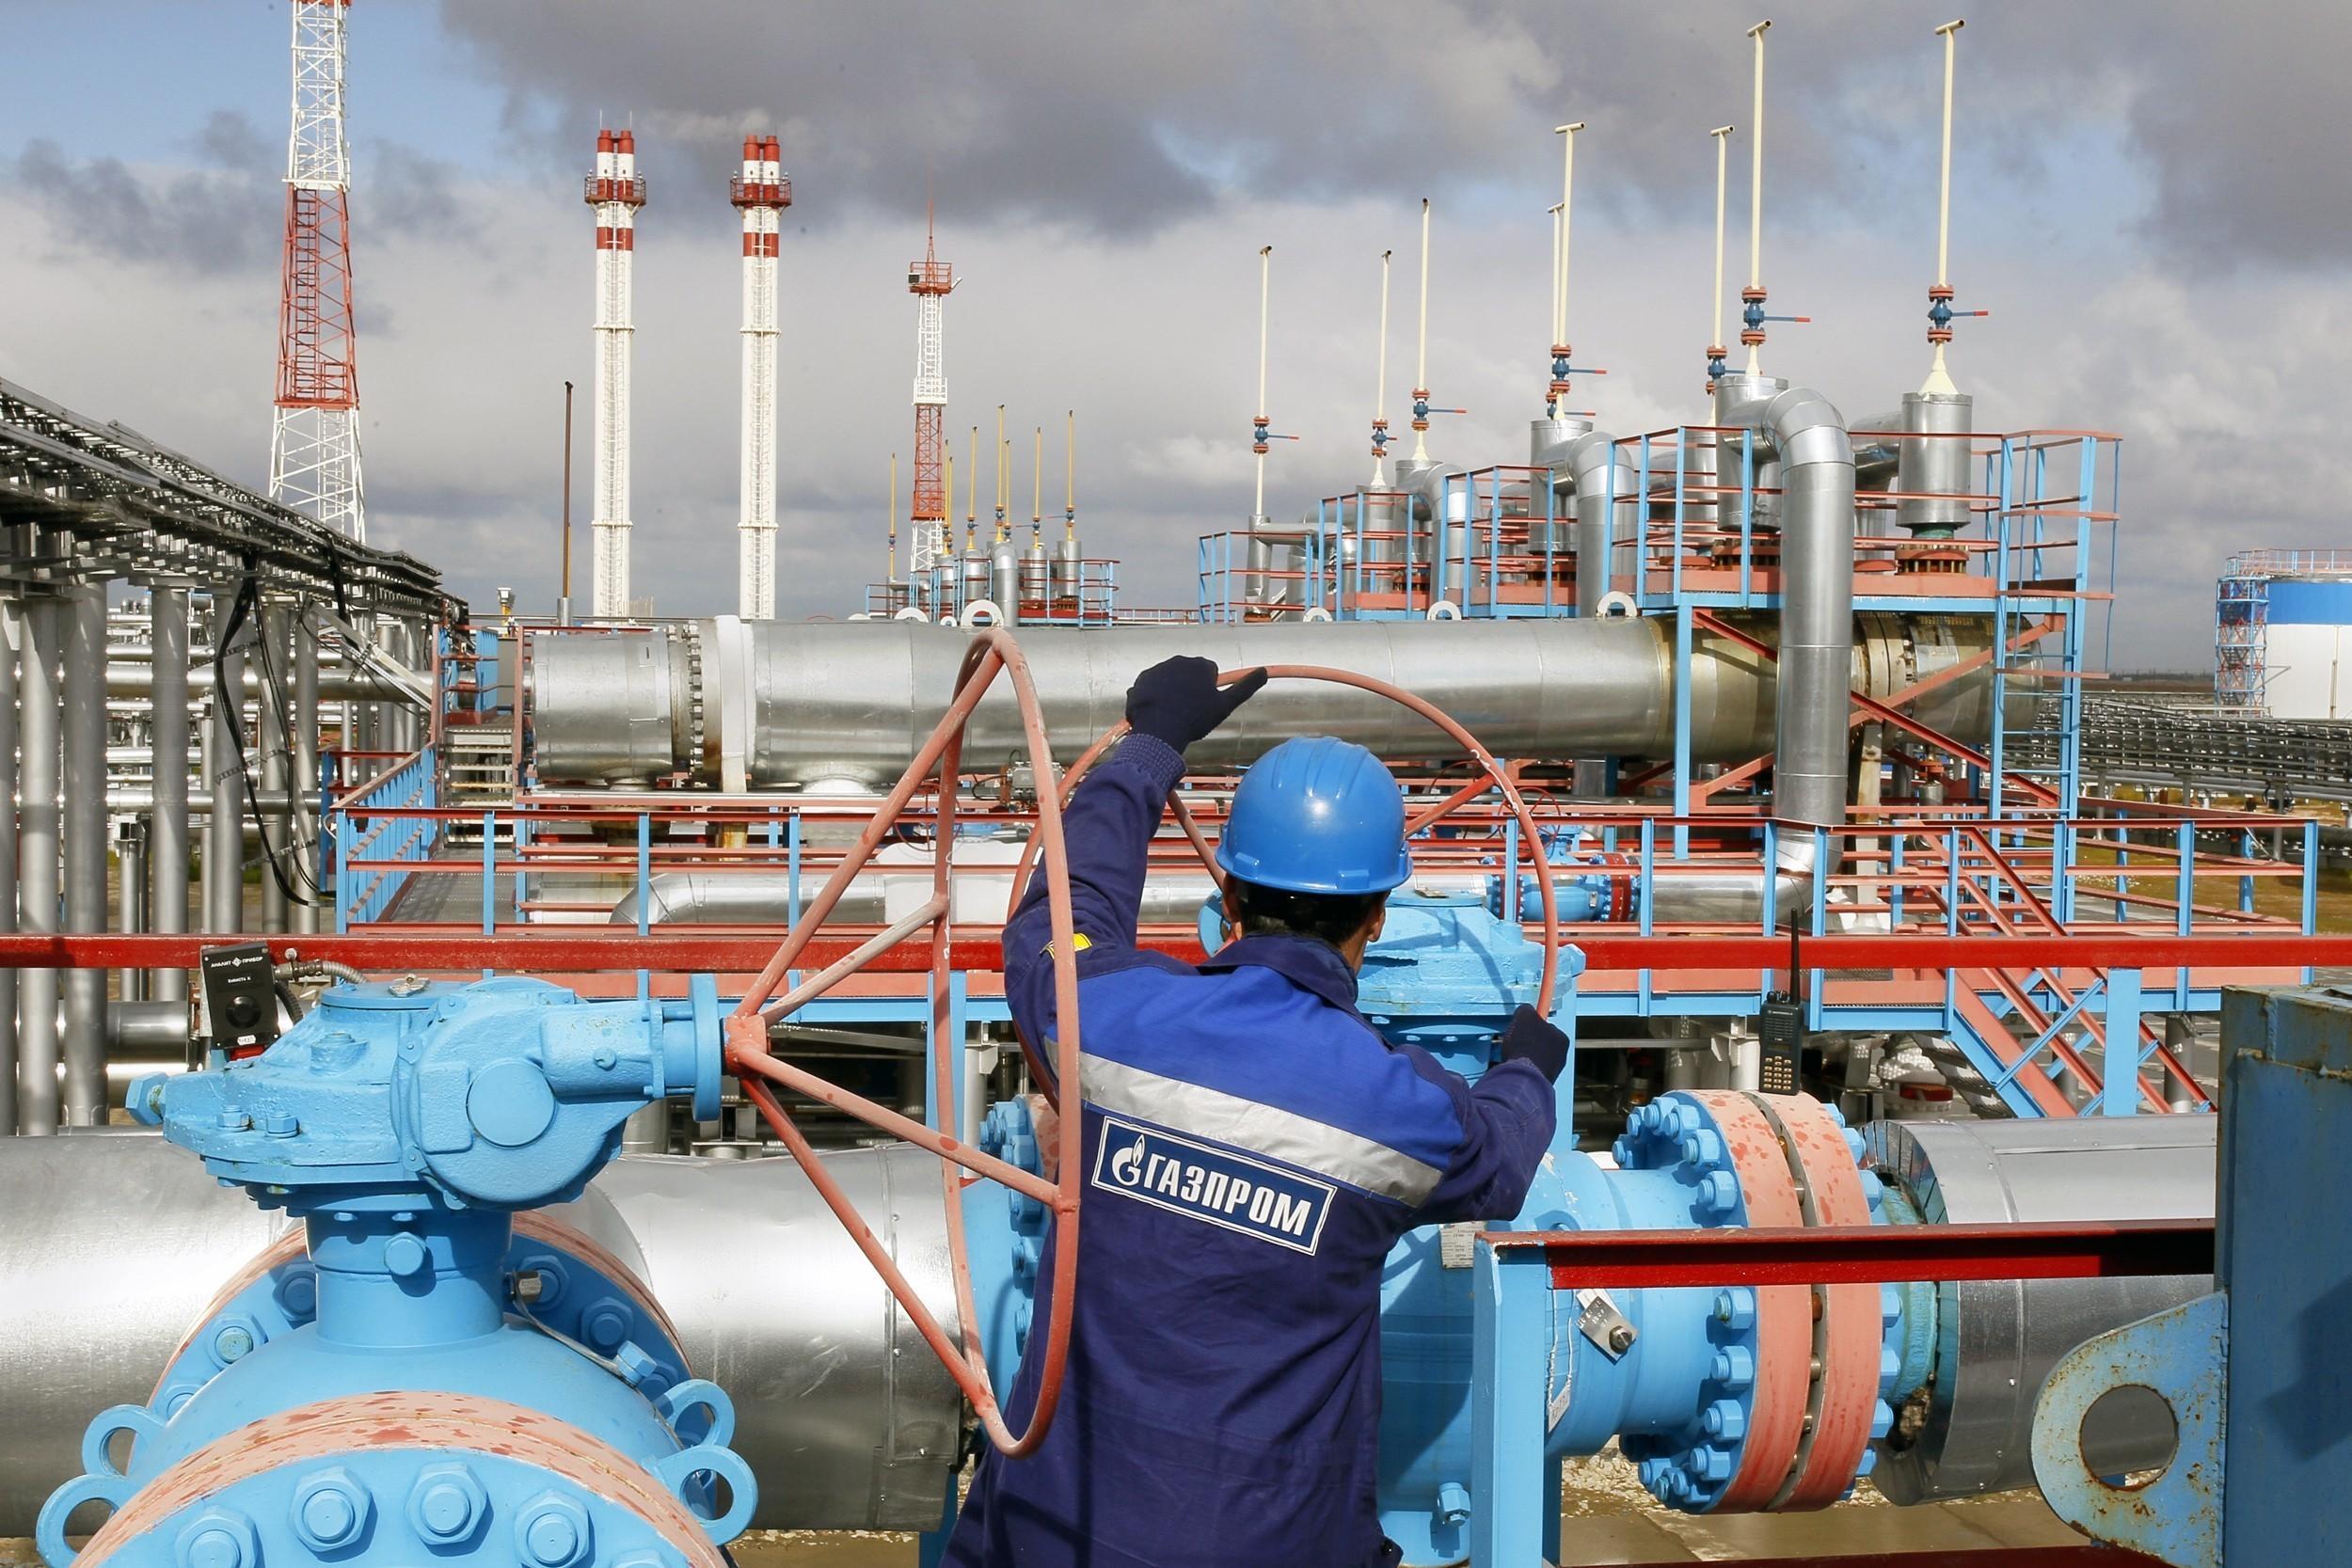 Gazprom 11773